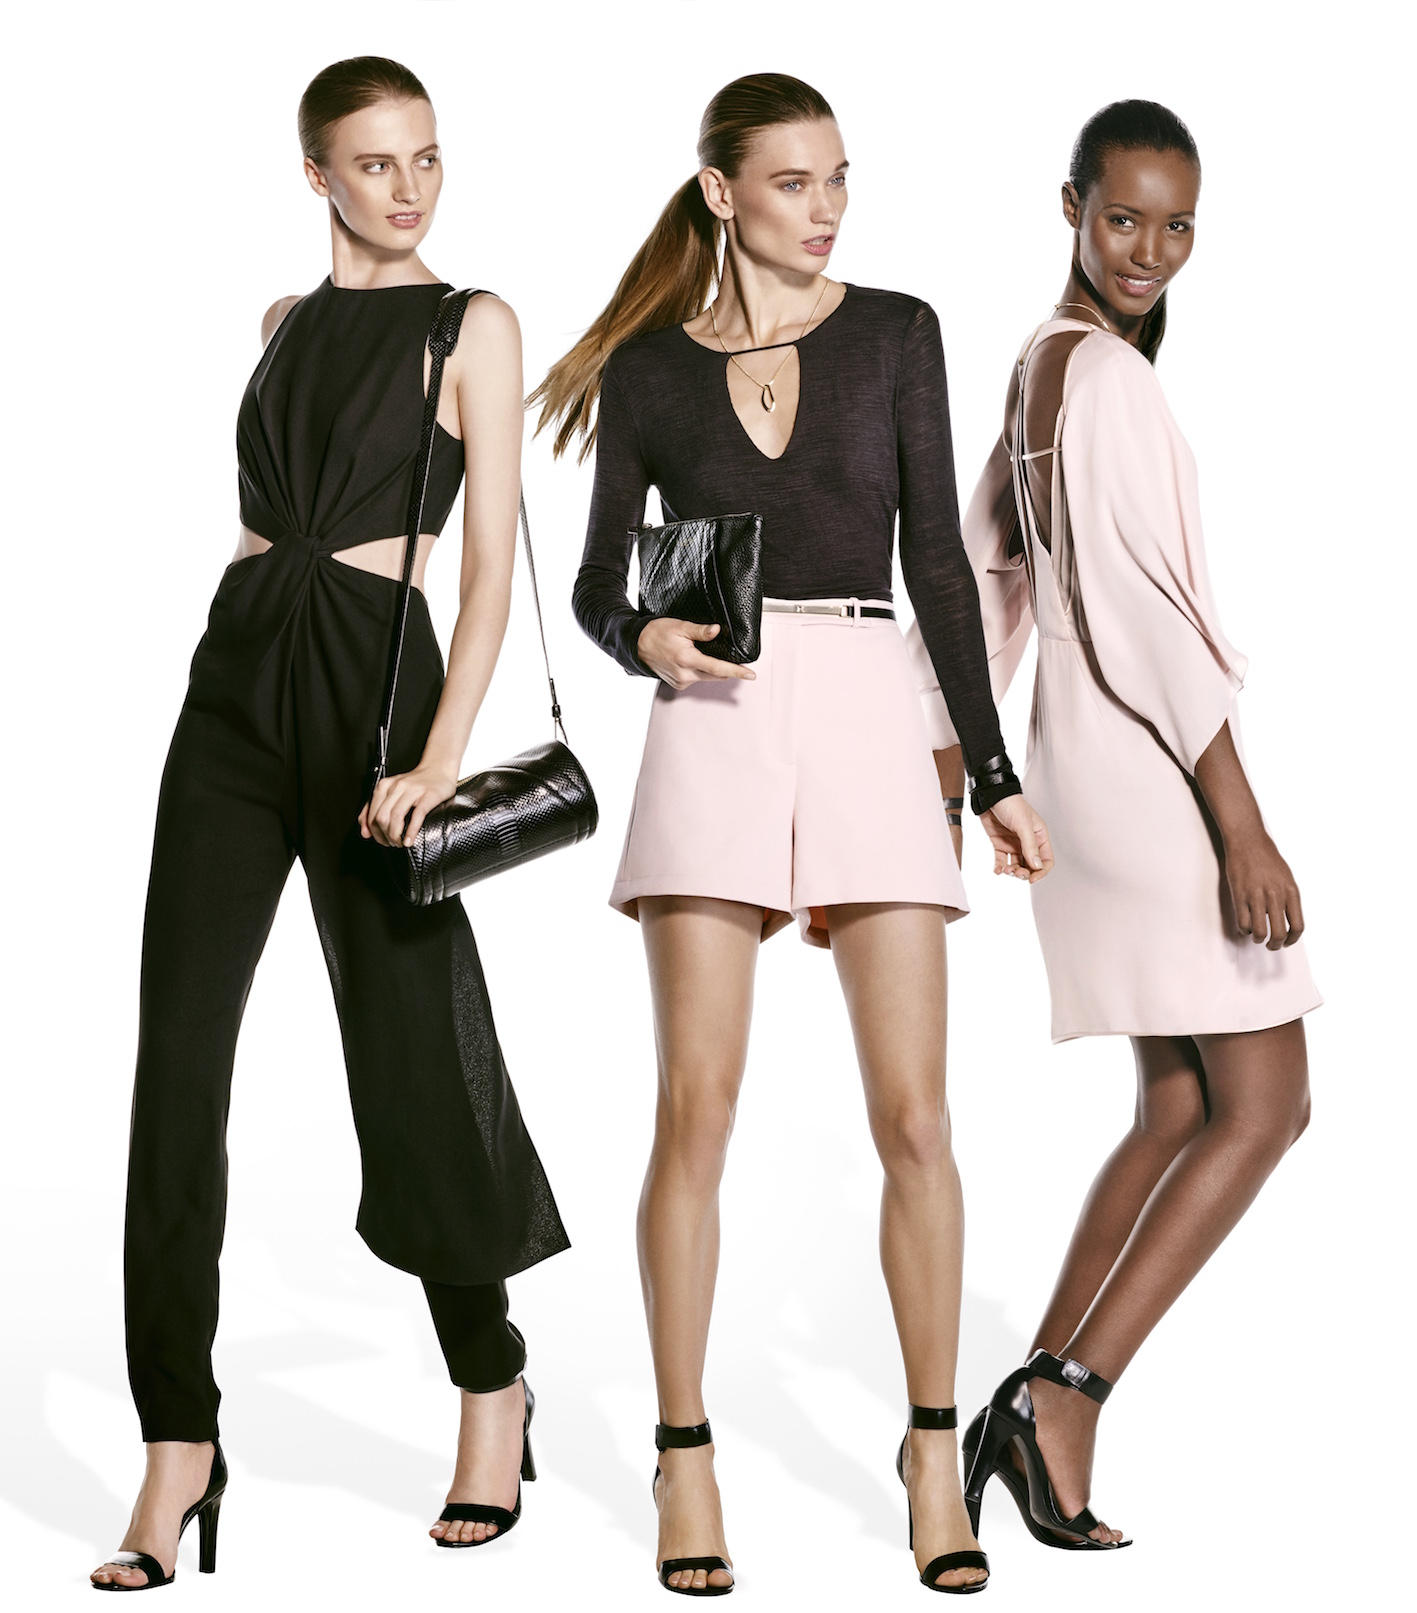 Lesley Frowick, Liza Minnelli - Halston: American Fashion3